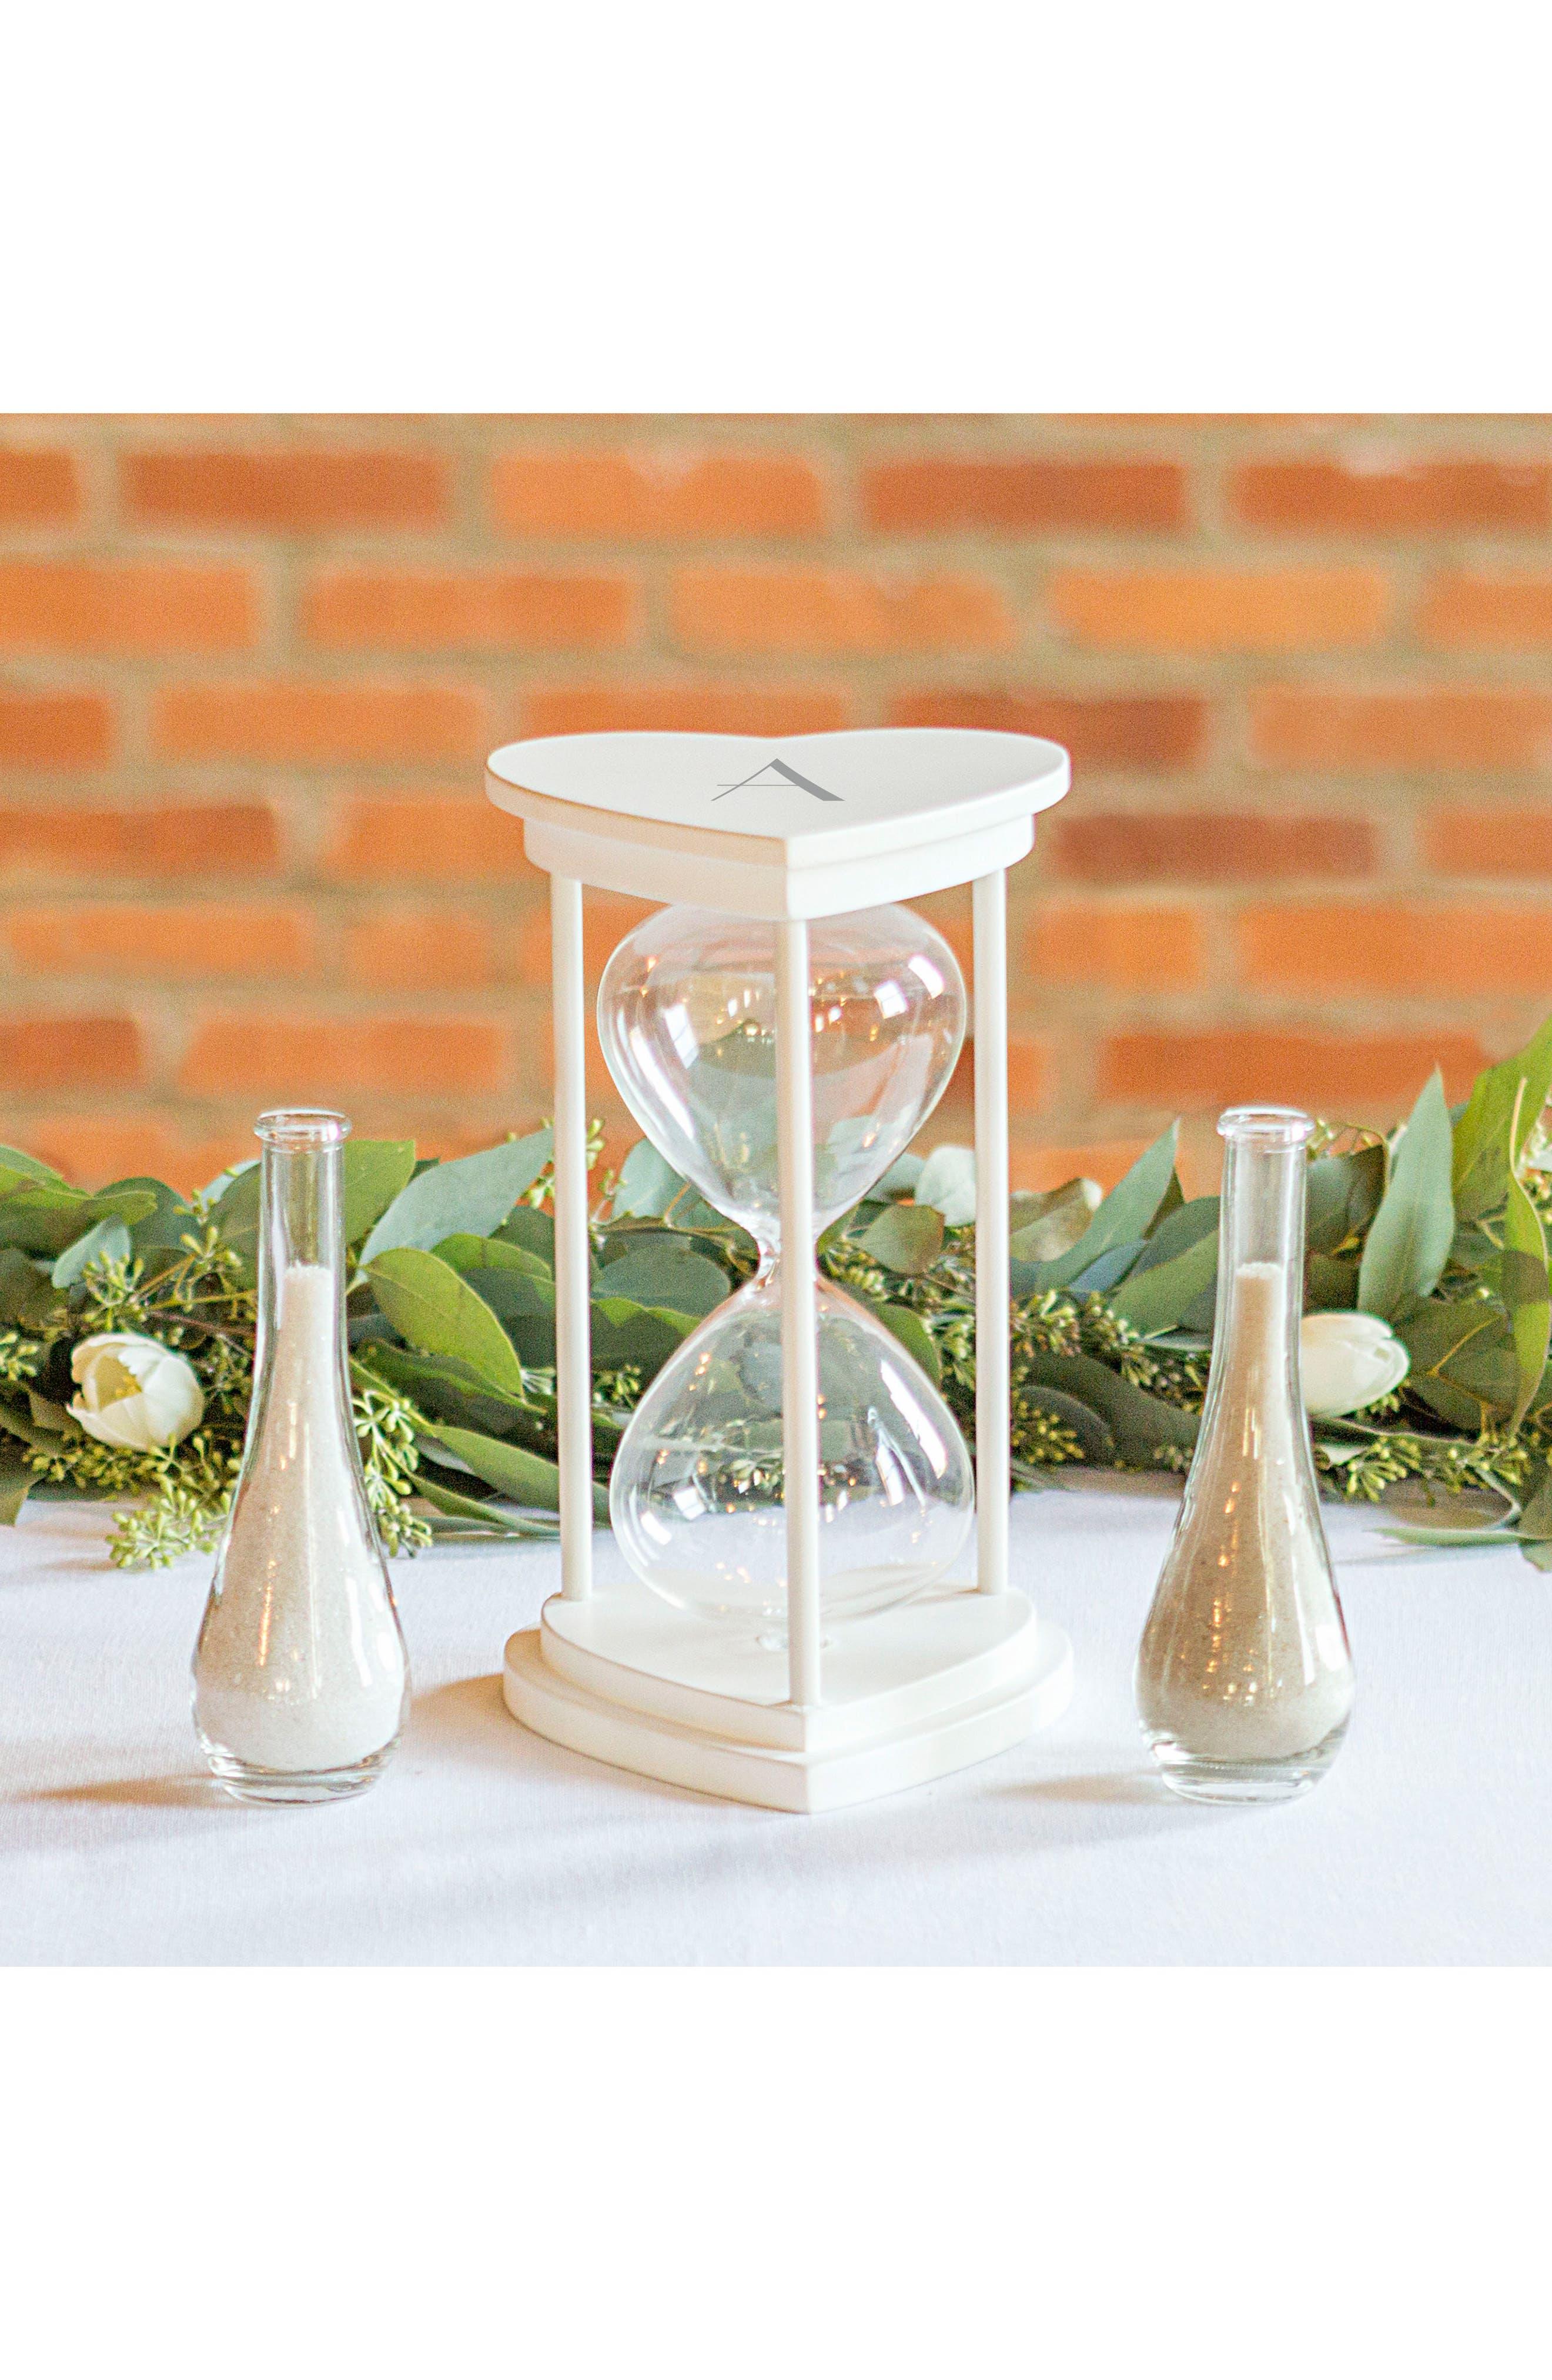 Monogram Unity Sand Ceremony Hourglass Set,                             Alternate thumbnail 4, color,                             040